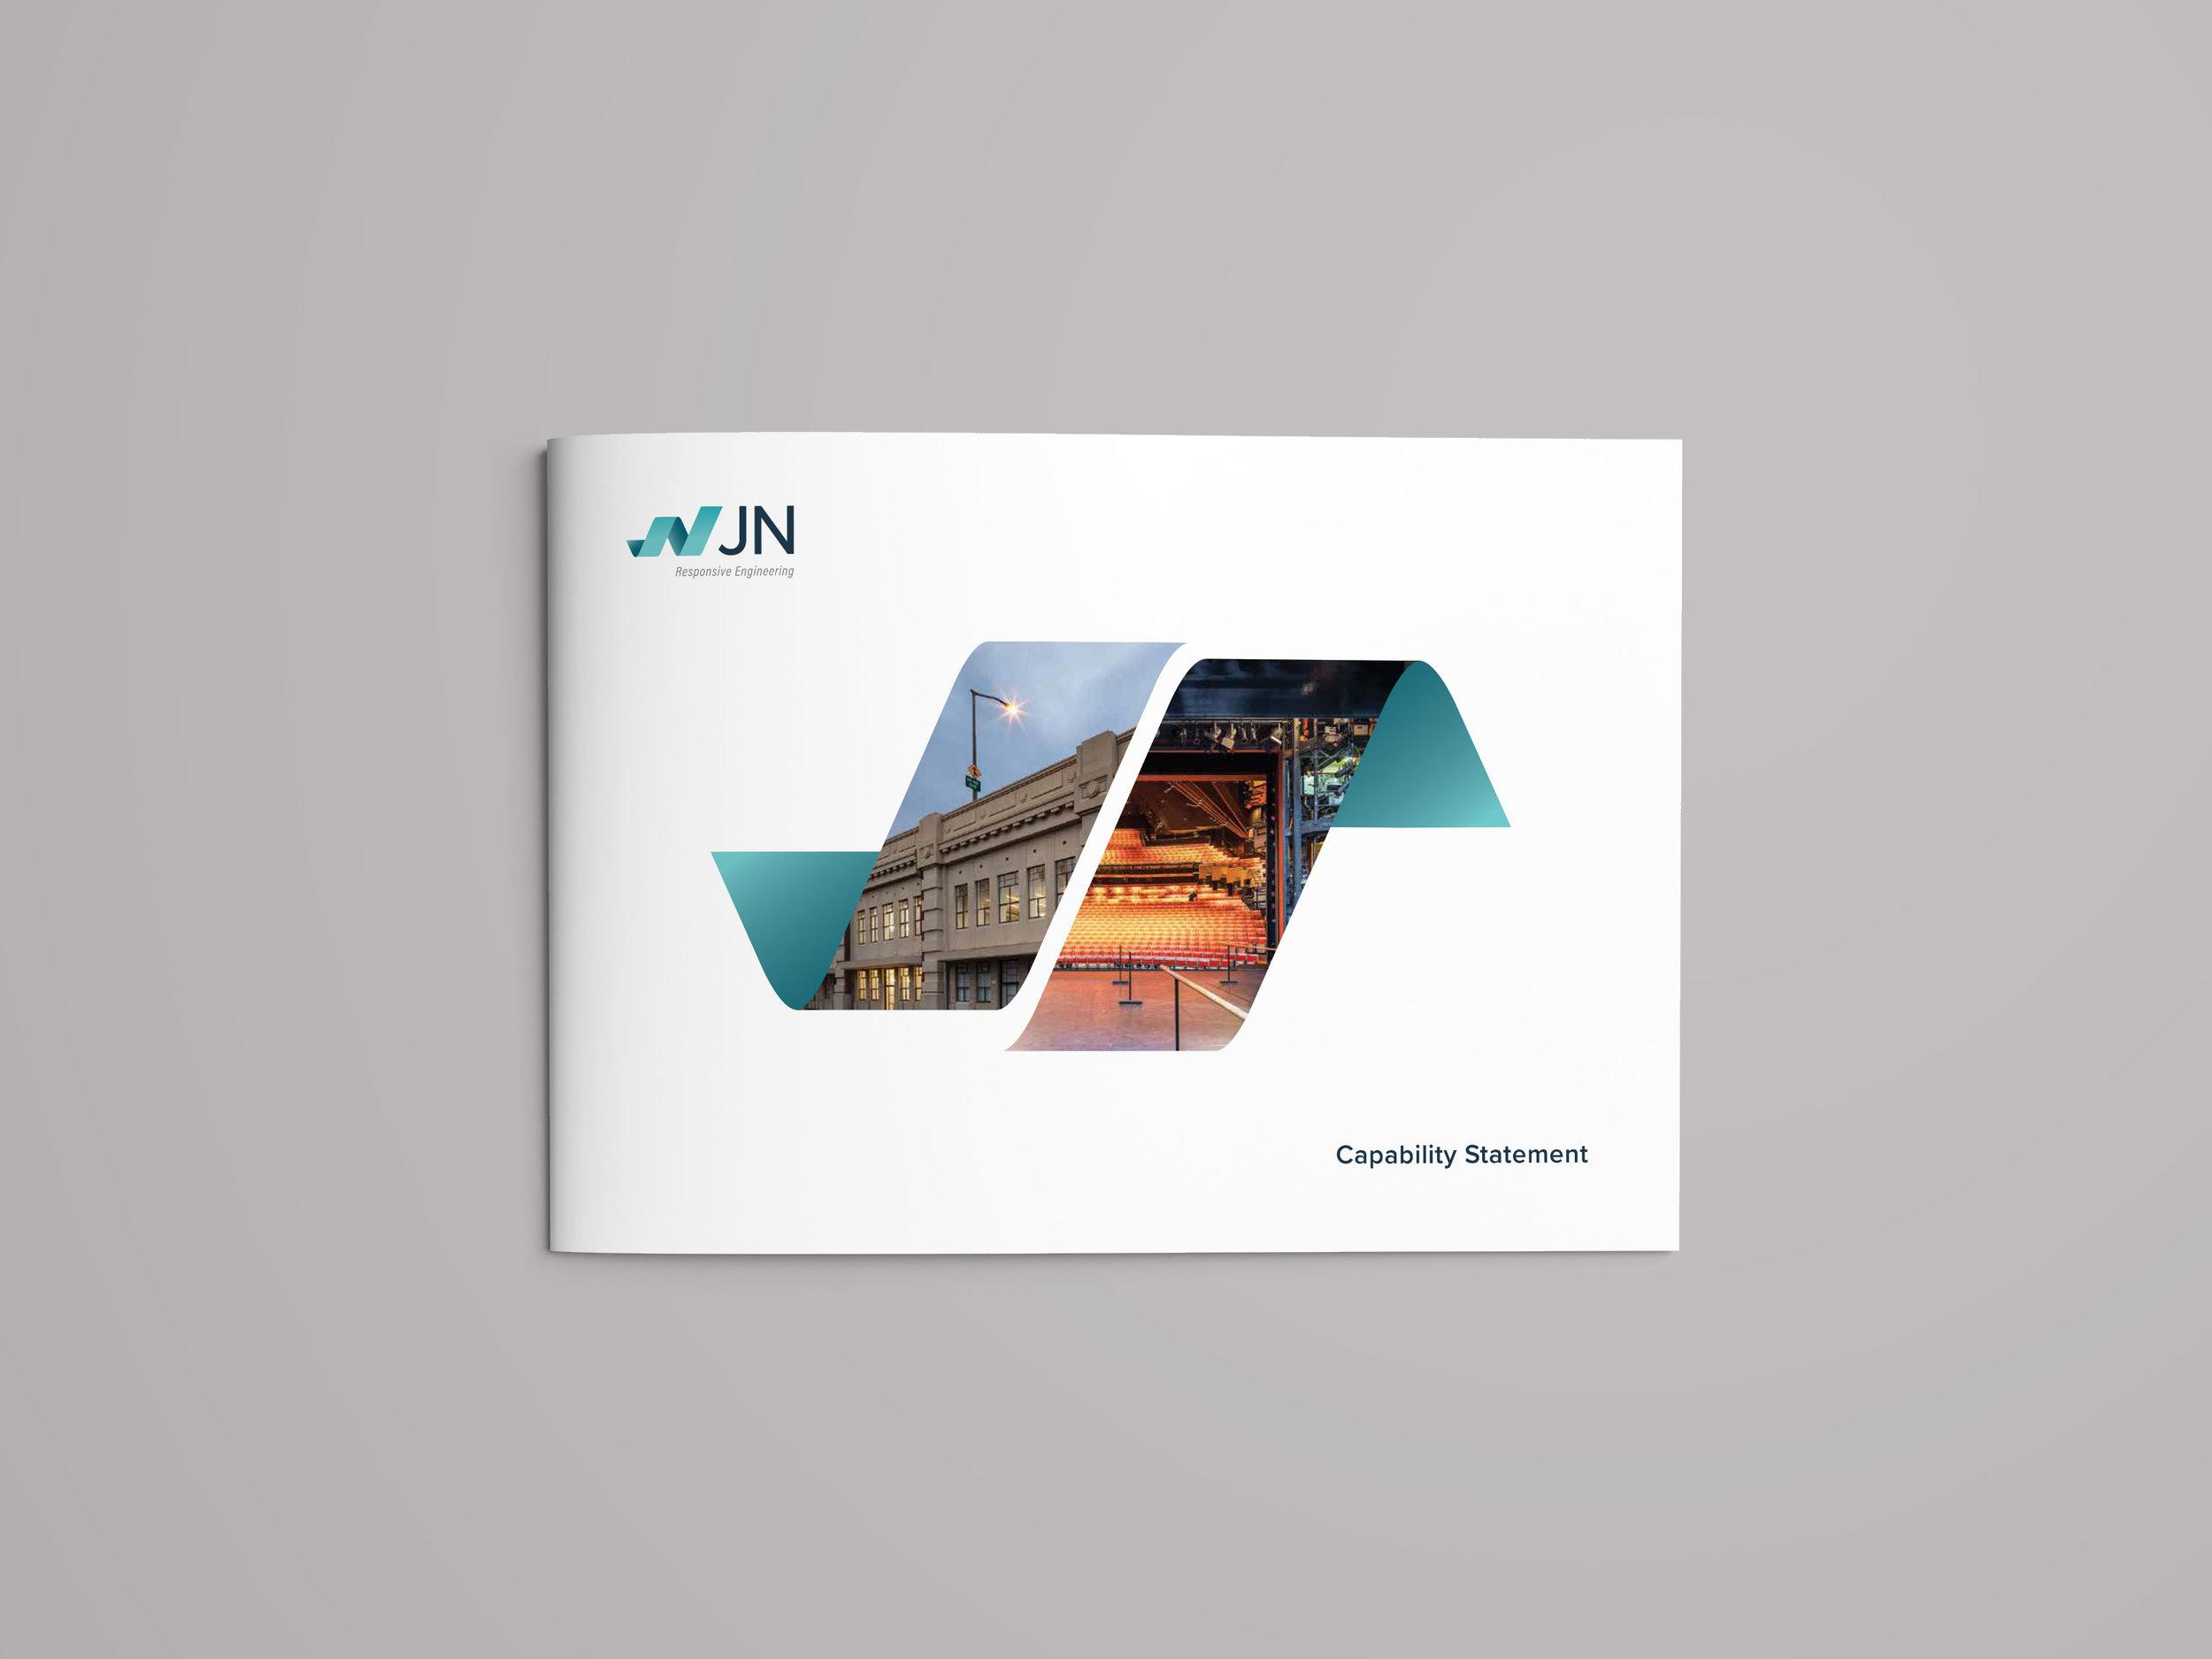 JN-Capability-Statement-1.jpg